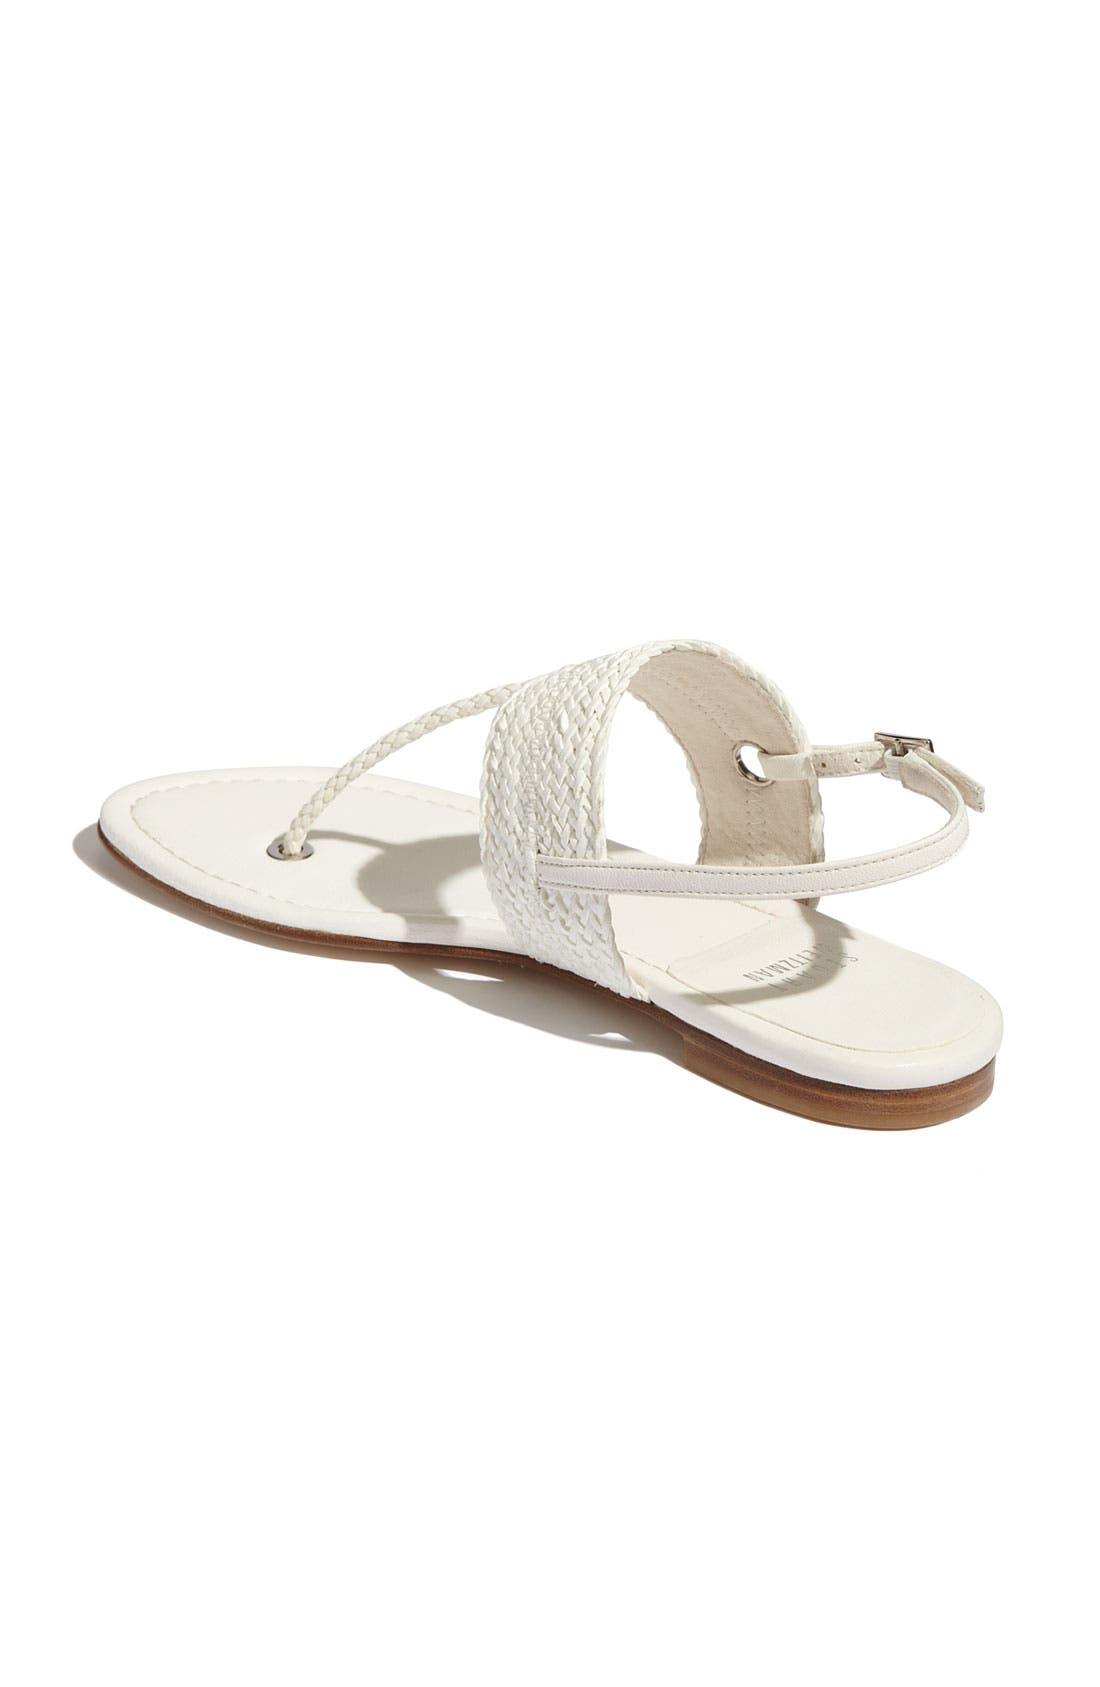 Alternate Image 2  - Stuart Weitzman 'Bimini' Sandal